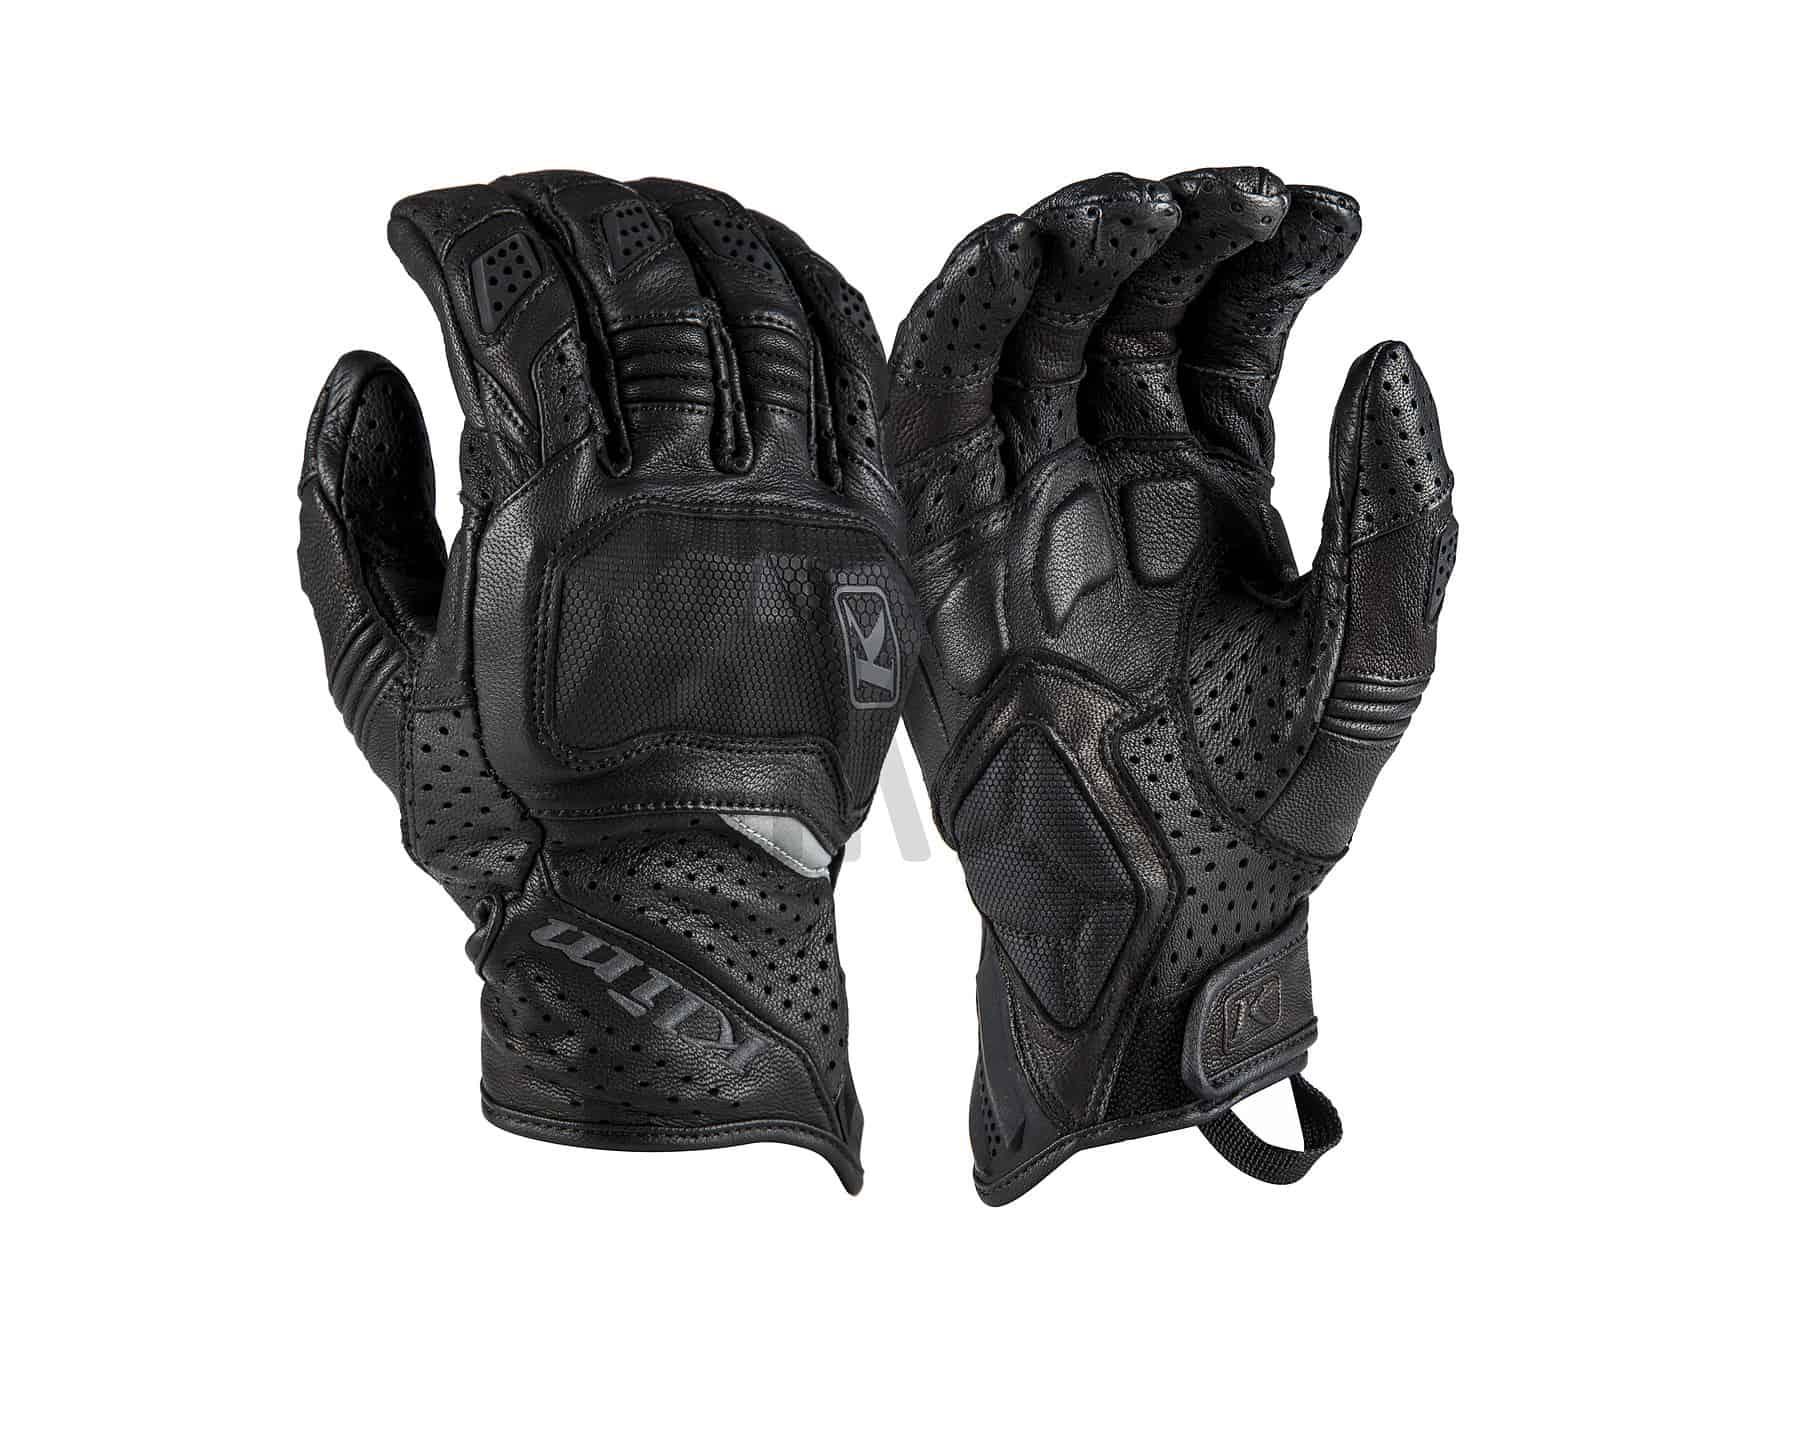 Badlands Aero Pro Short Glove_3924-000_Black_Secondary_01